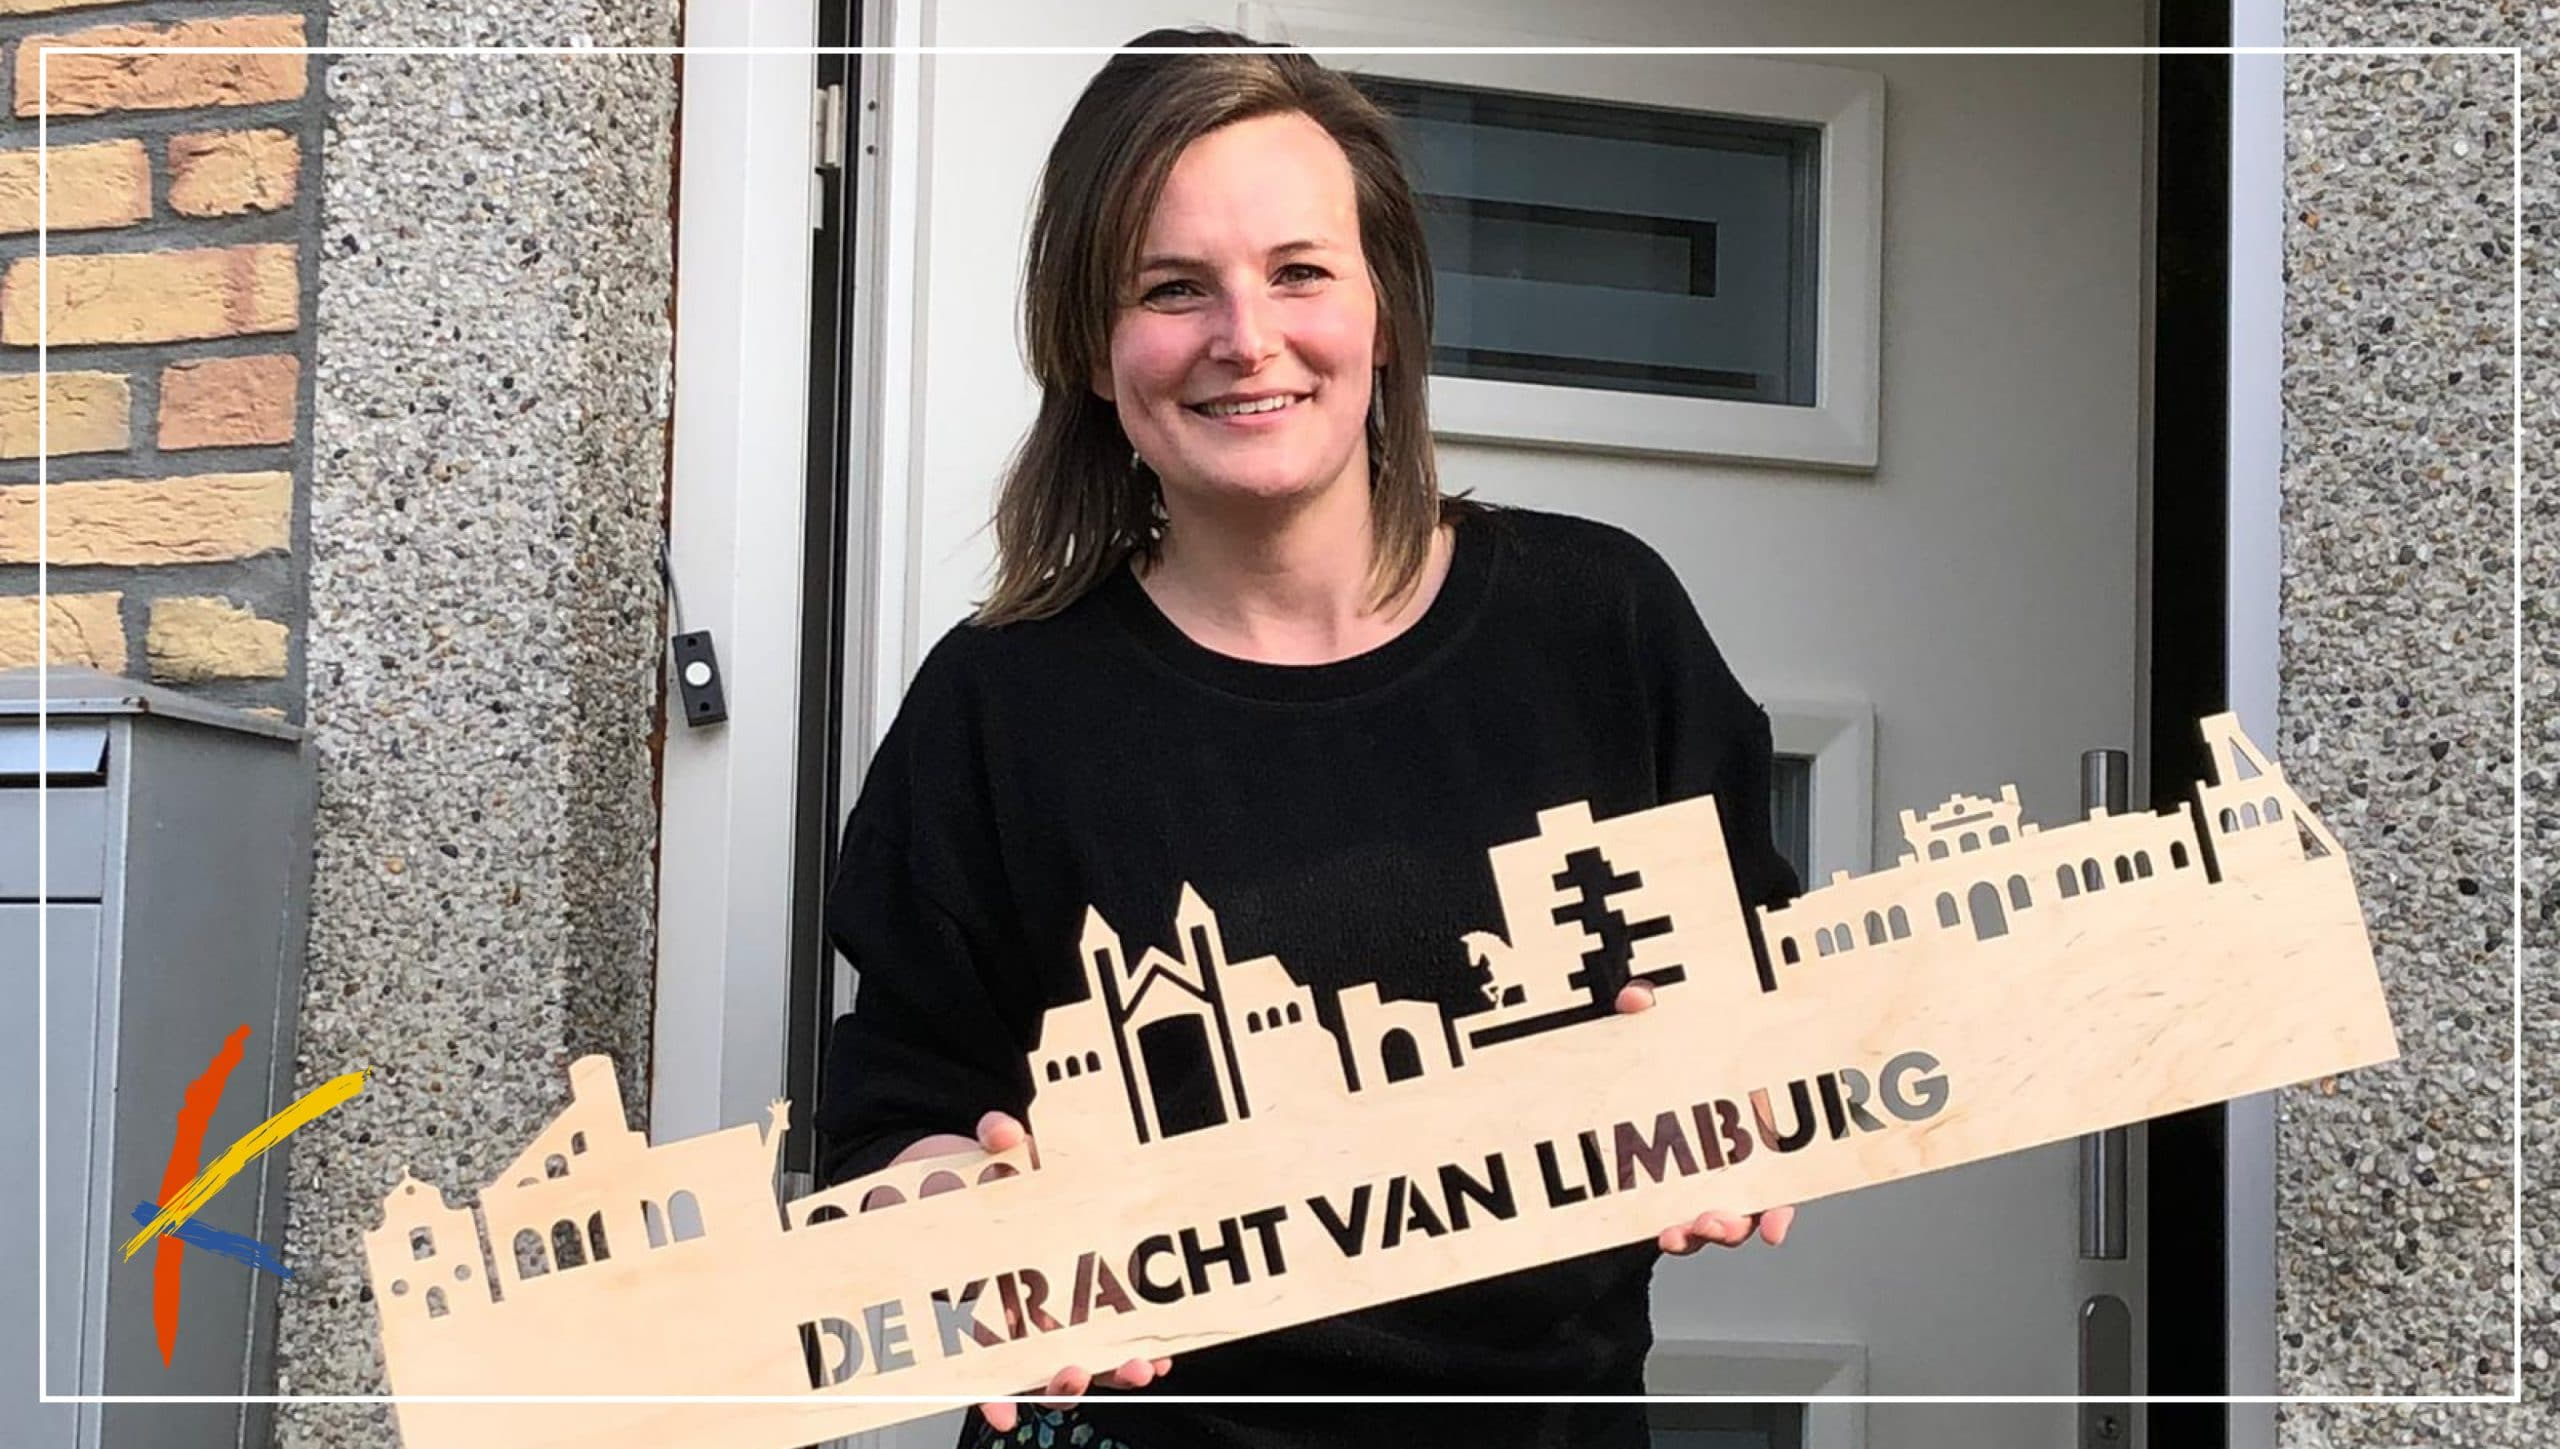 Dyanne Sleijpen